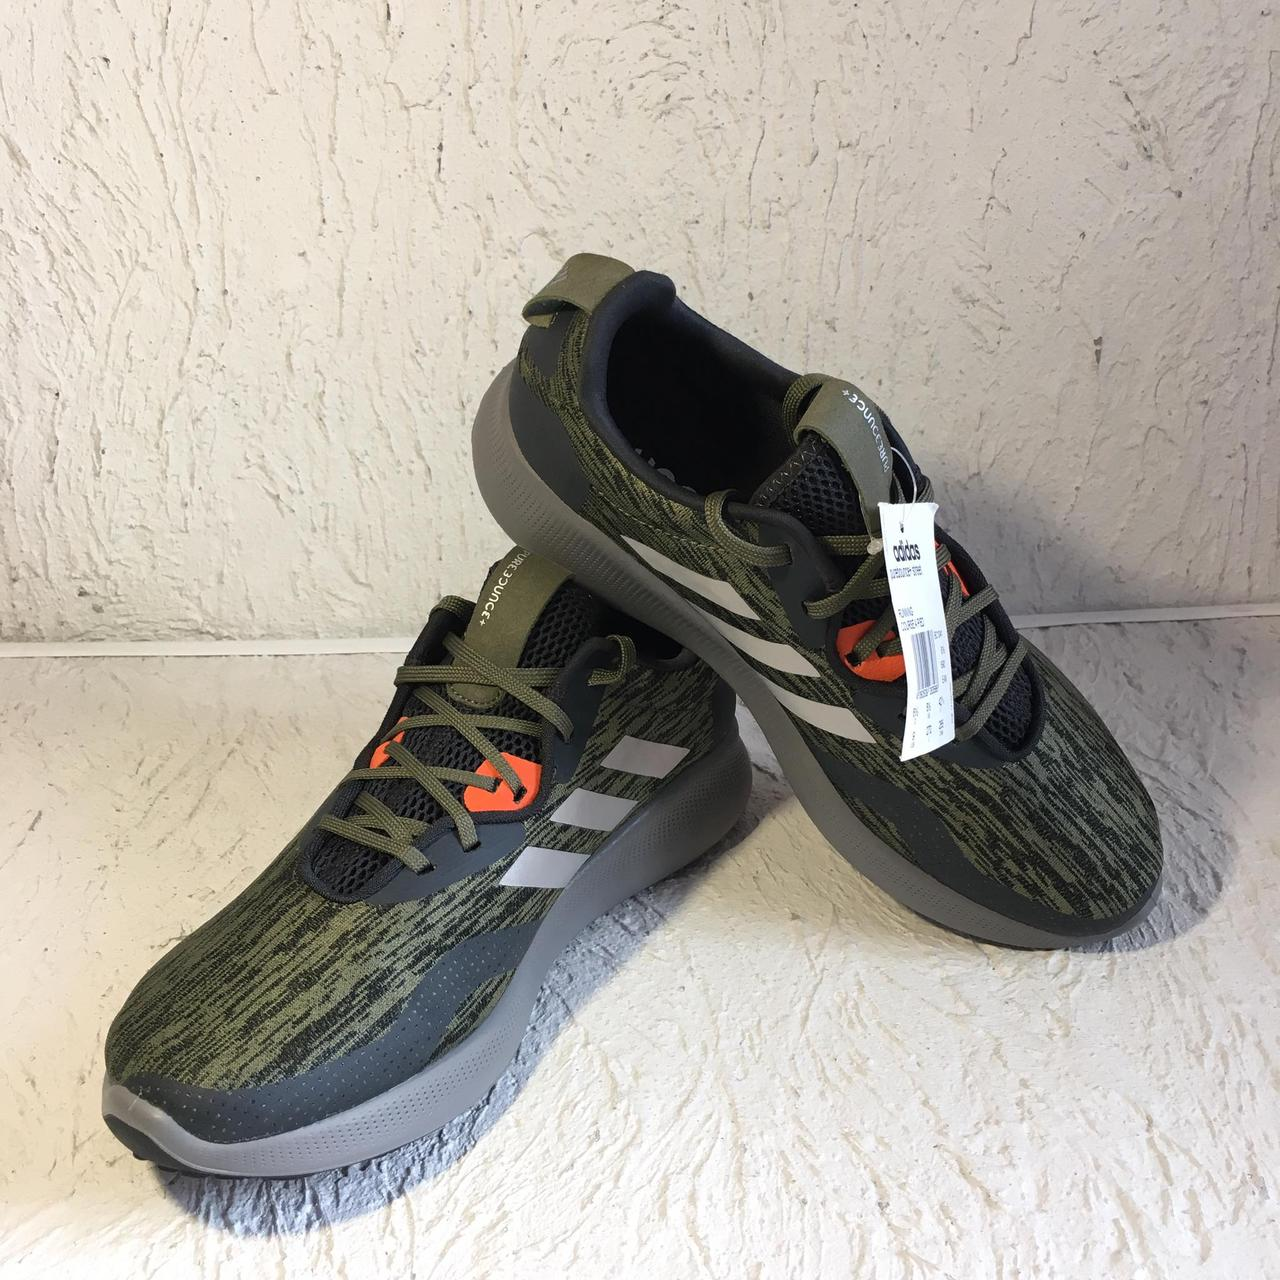 Кроссовки Adidas Purebounce+ BC1041 42 2/3 размер